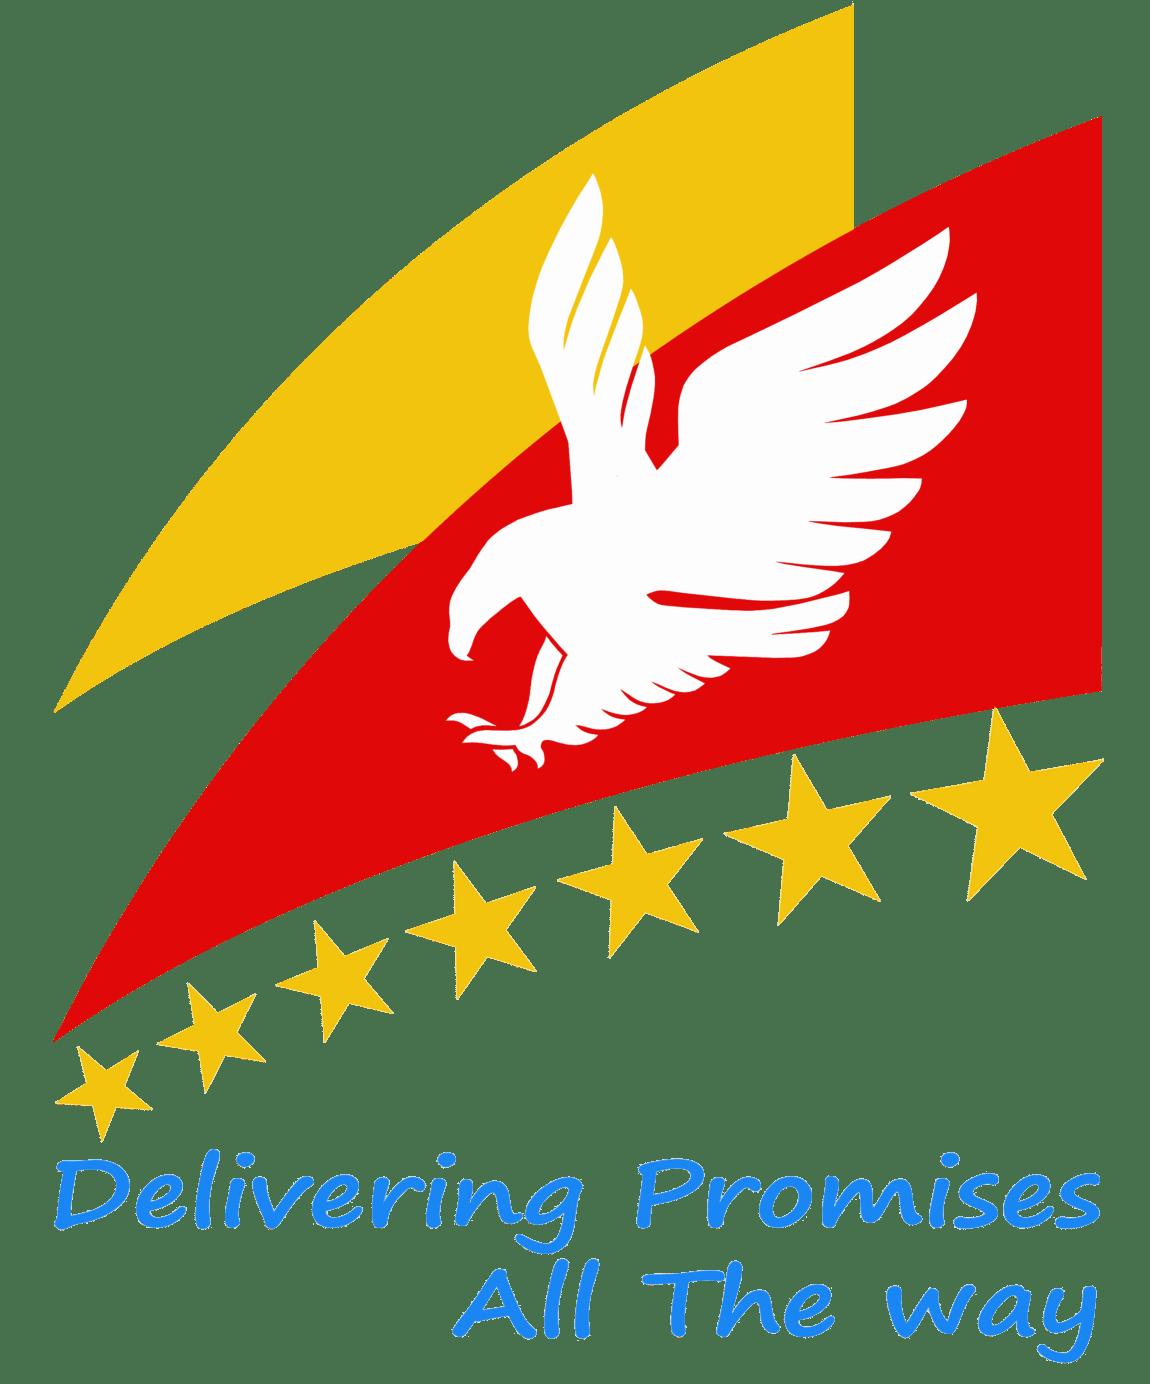 V-Etico Services